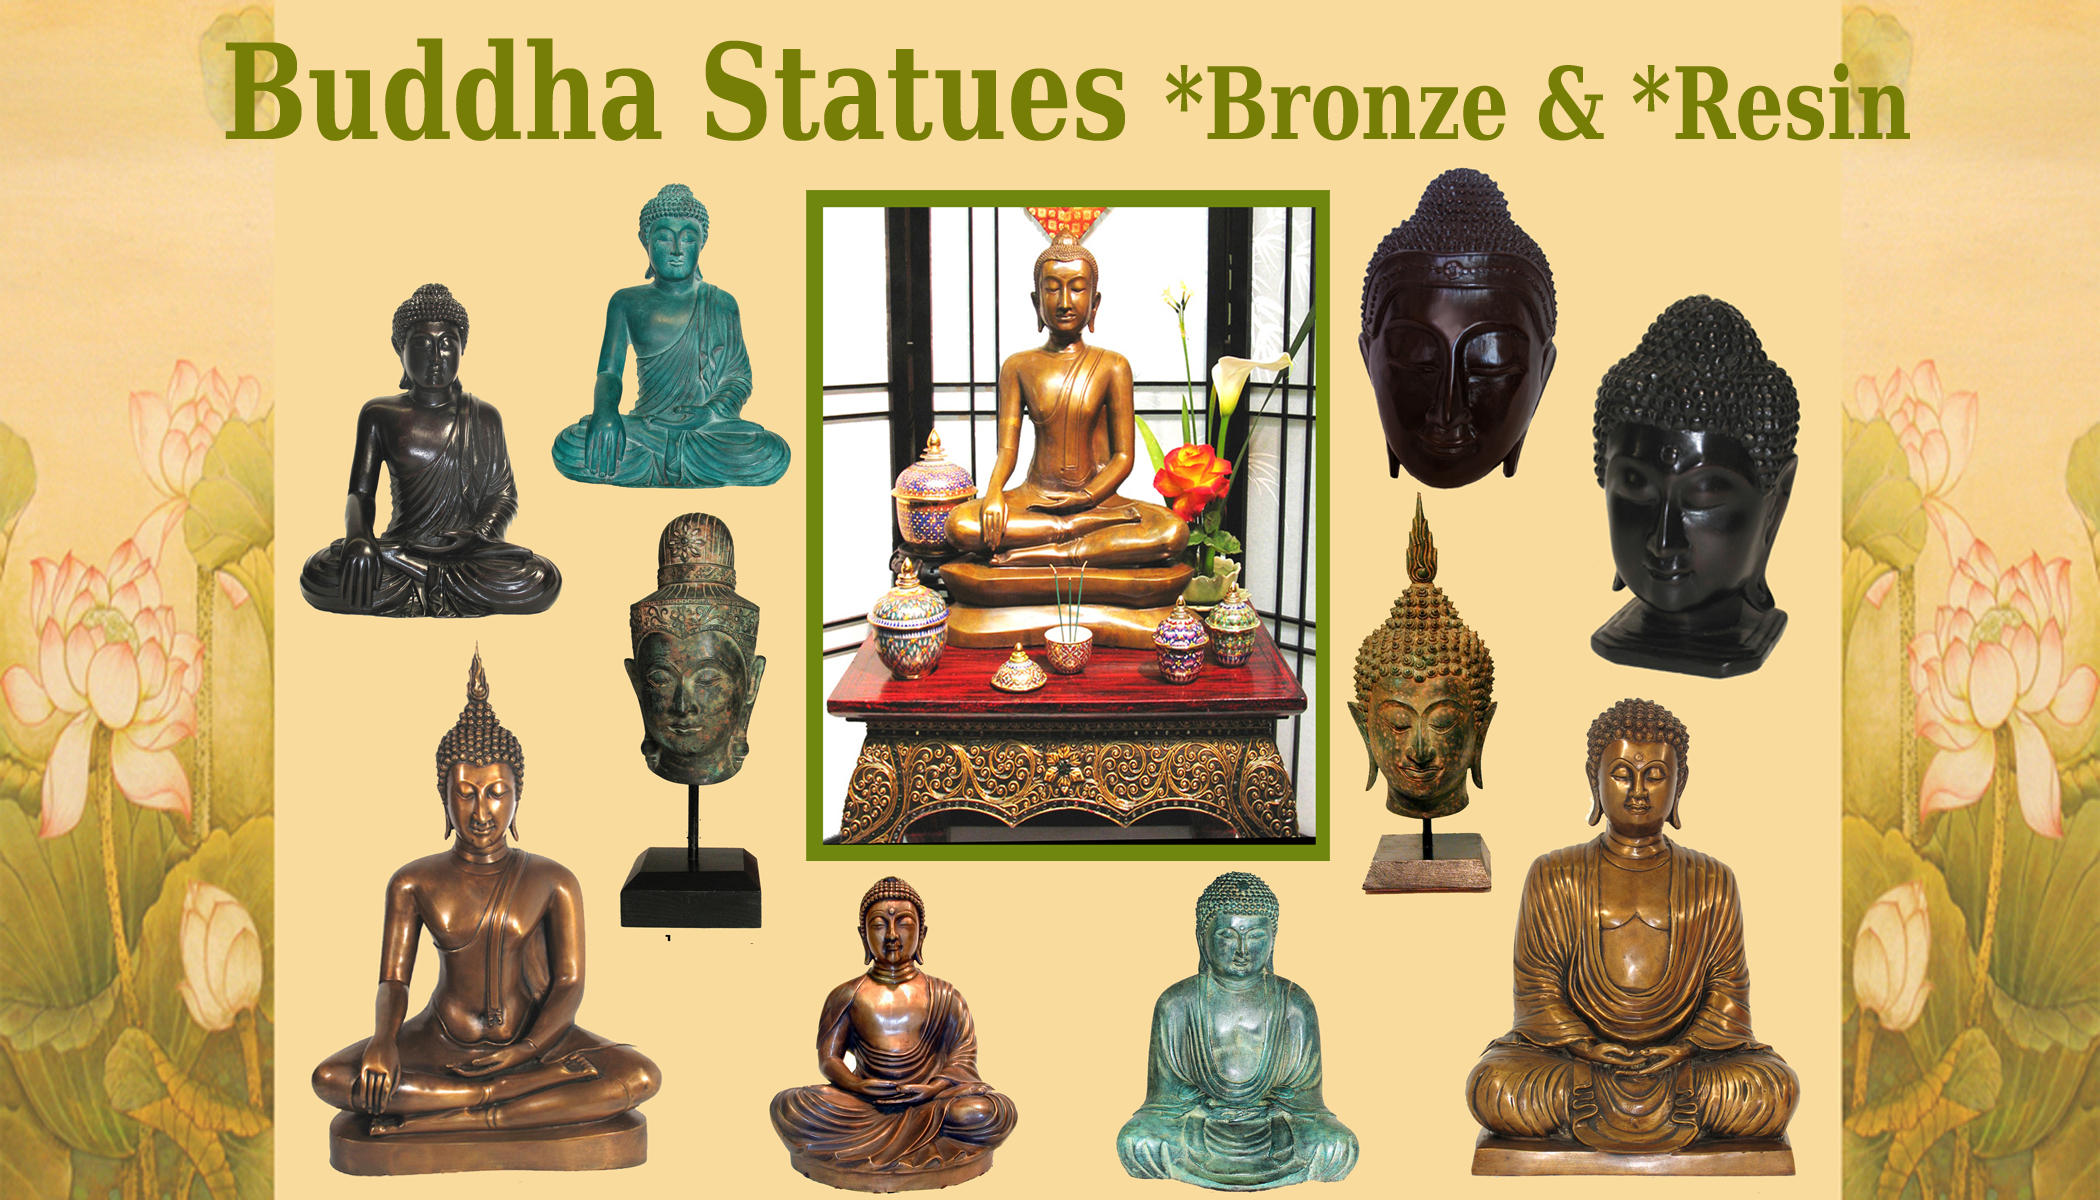 bronzestatueswebsite.jpg